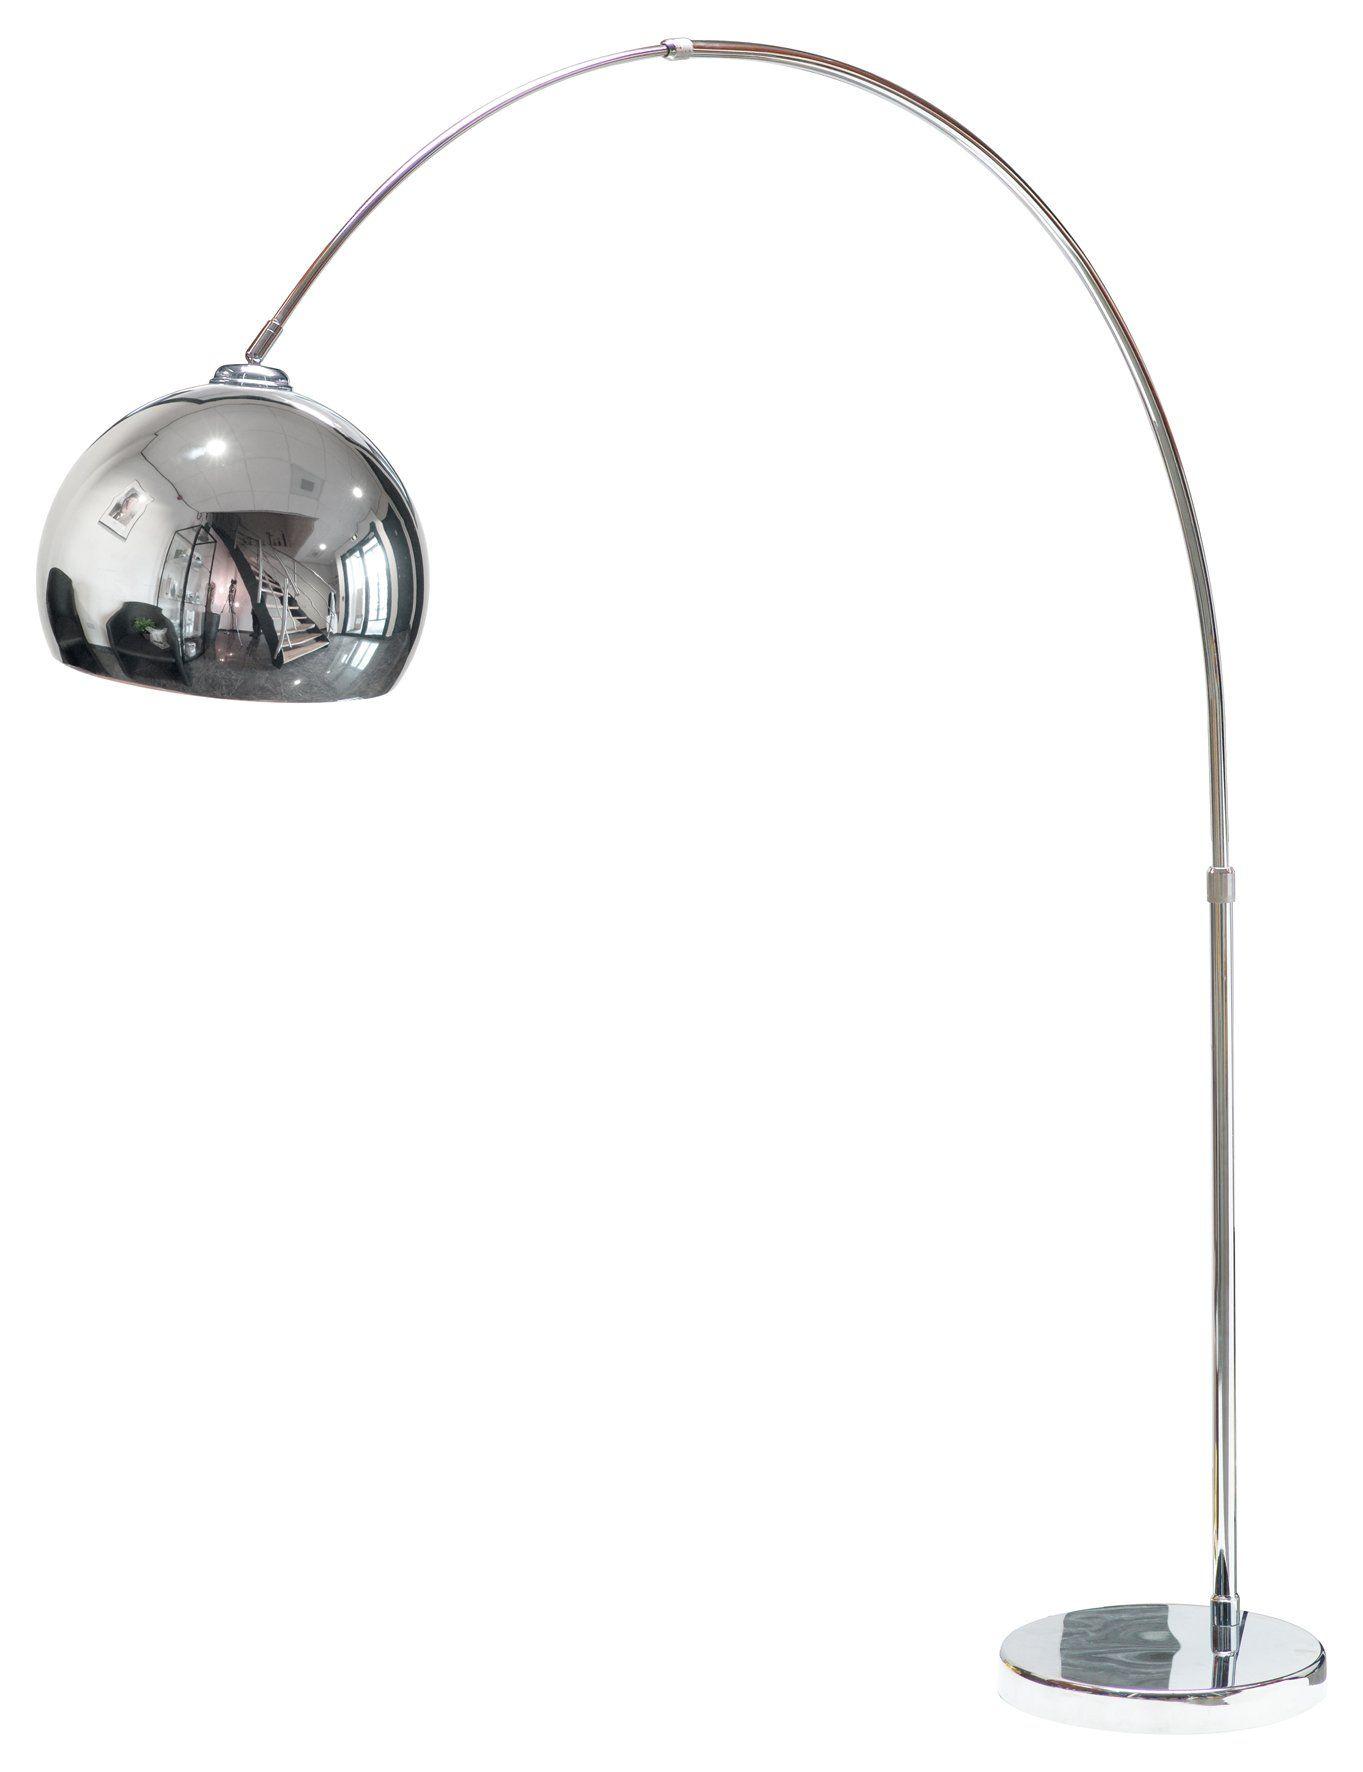 Ranex nicky 6000203 metal floor lamp chrome floor lamps ranex nicky 6000203 metal floor lamp chrome mozeypictures Choice Image